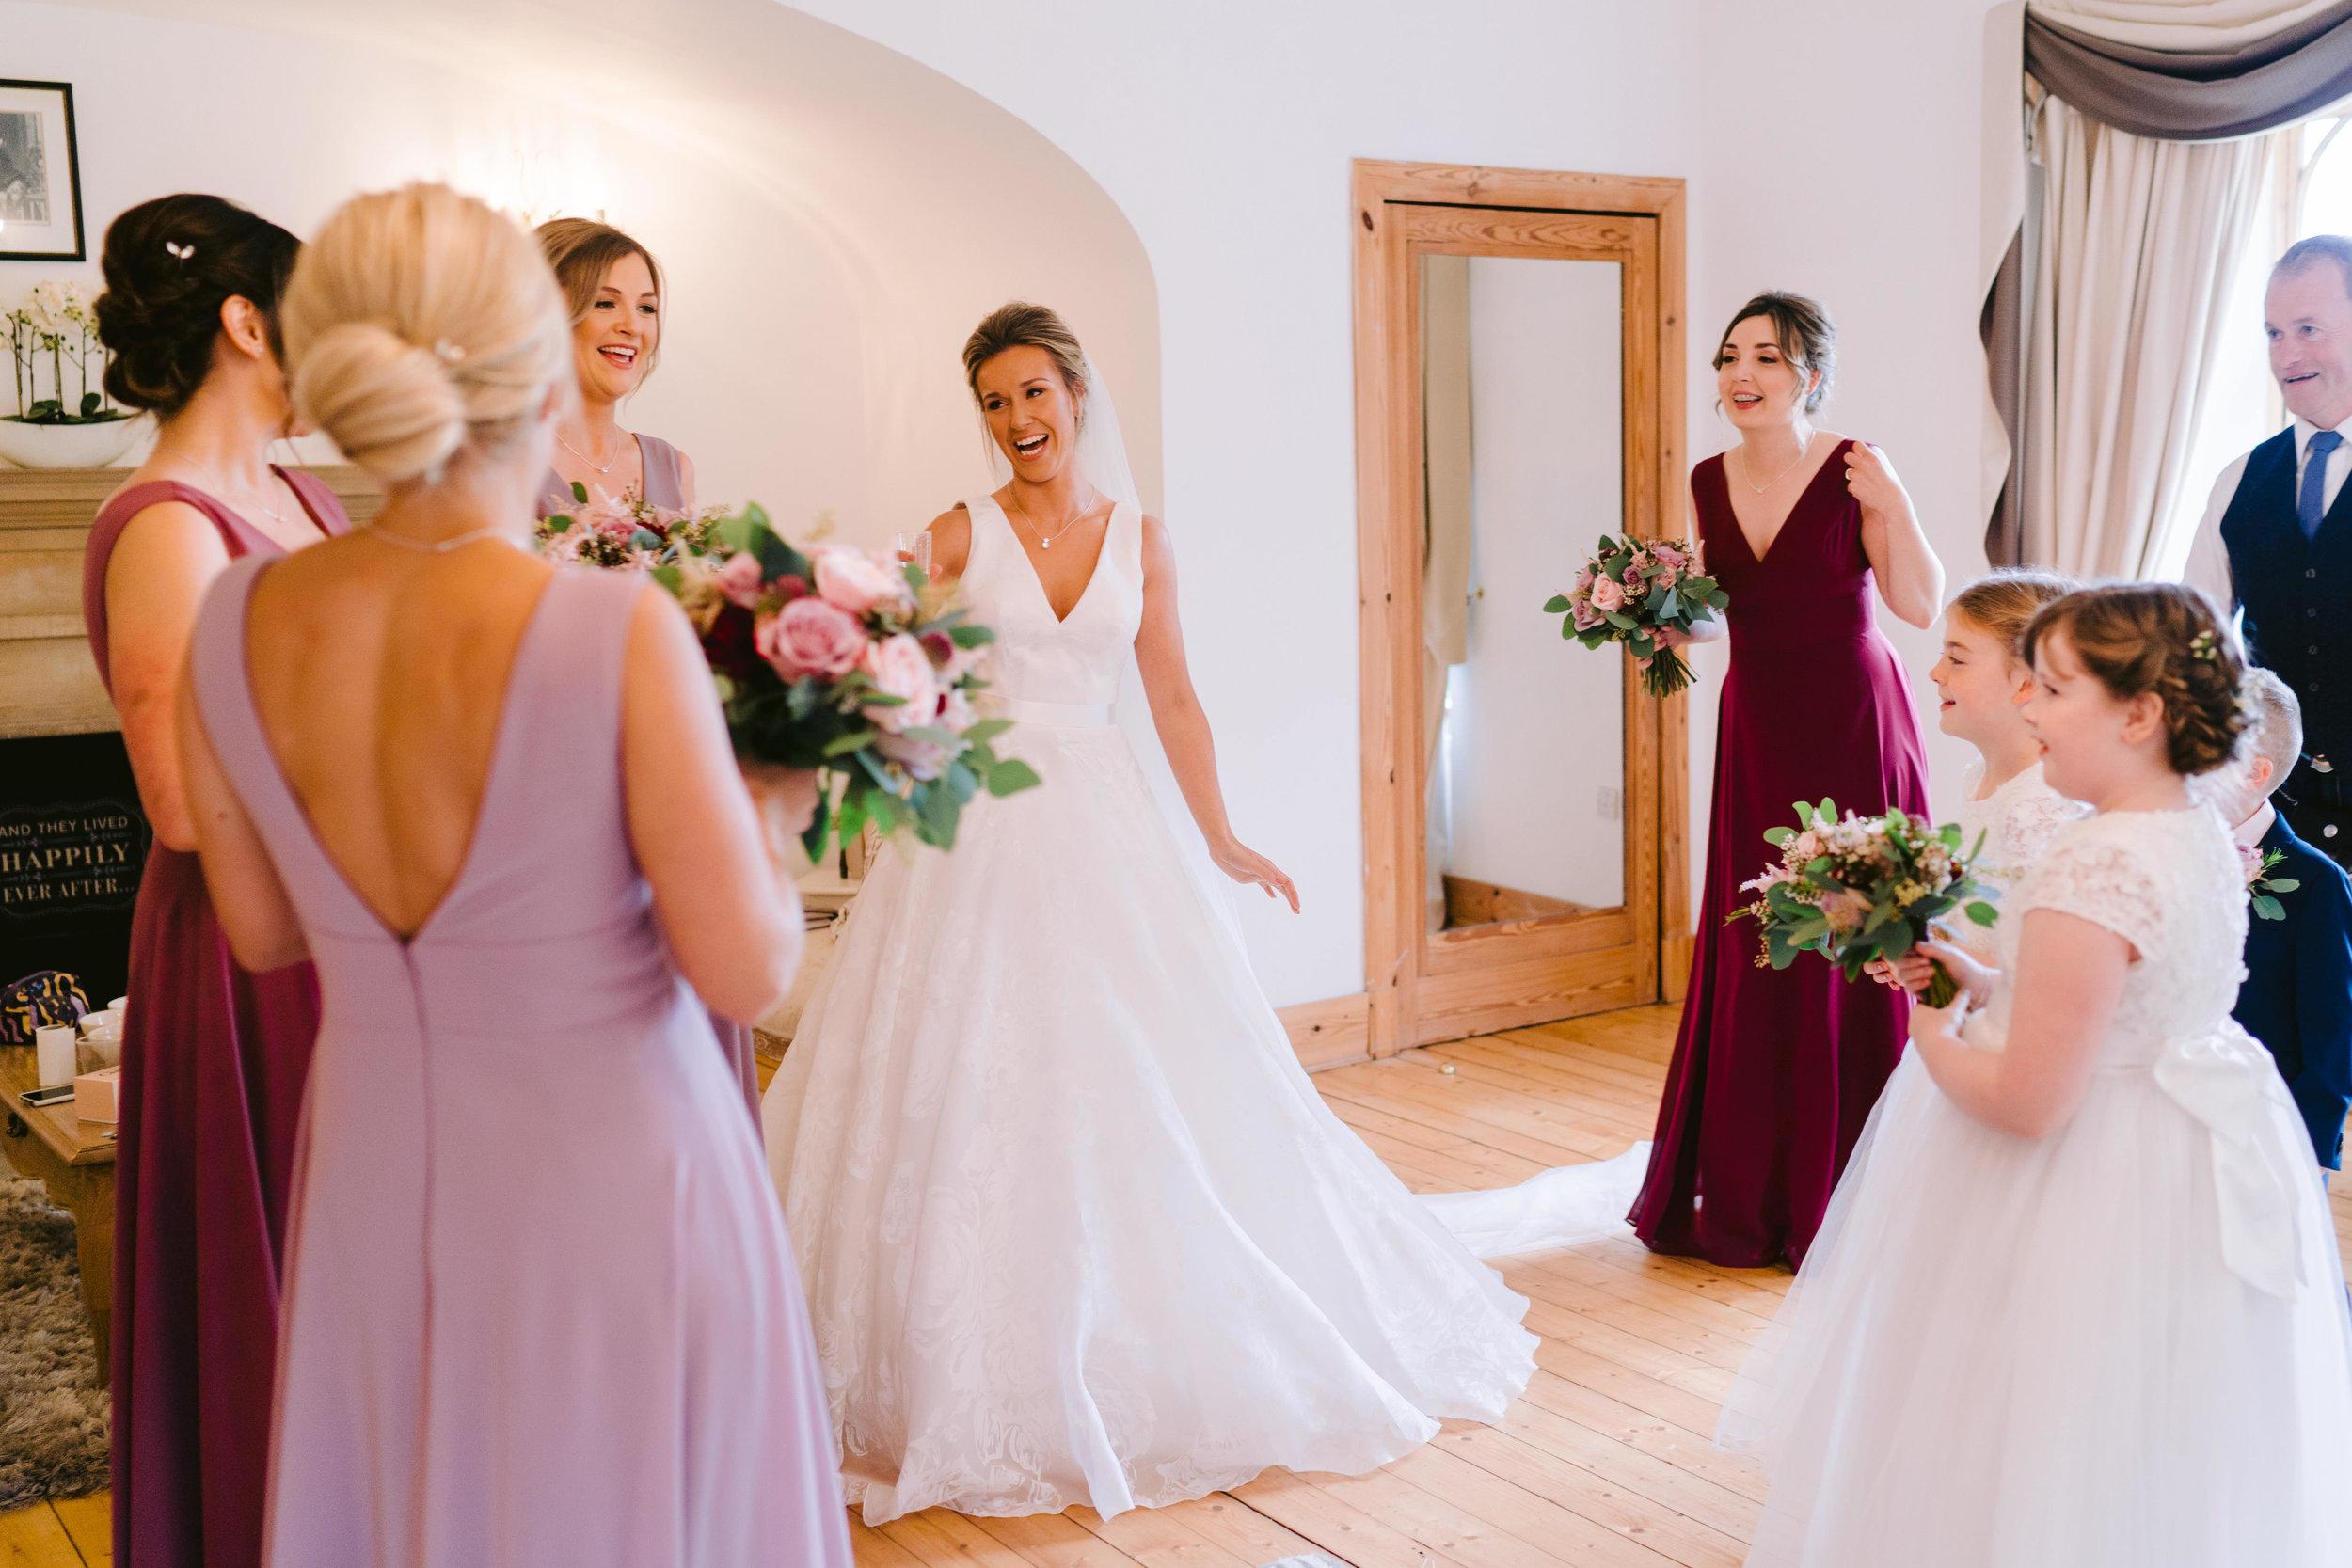 Karin_and_Shauns_Wedding_-_Achnagairn_Castle_-_www.eilidhrobertson.co.uk-320.jpg